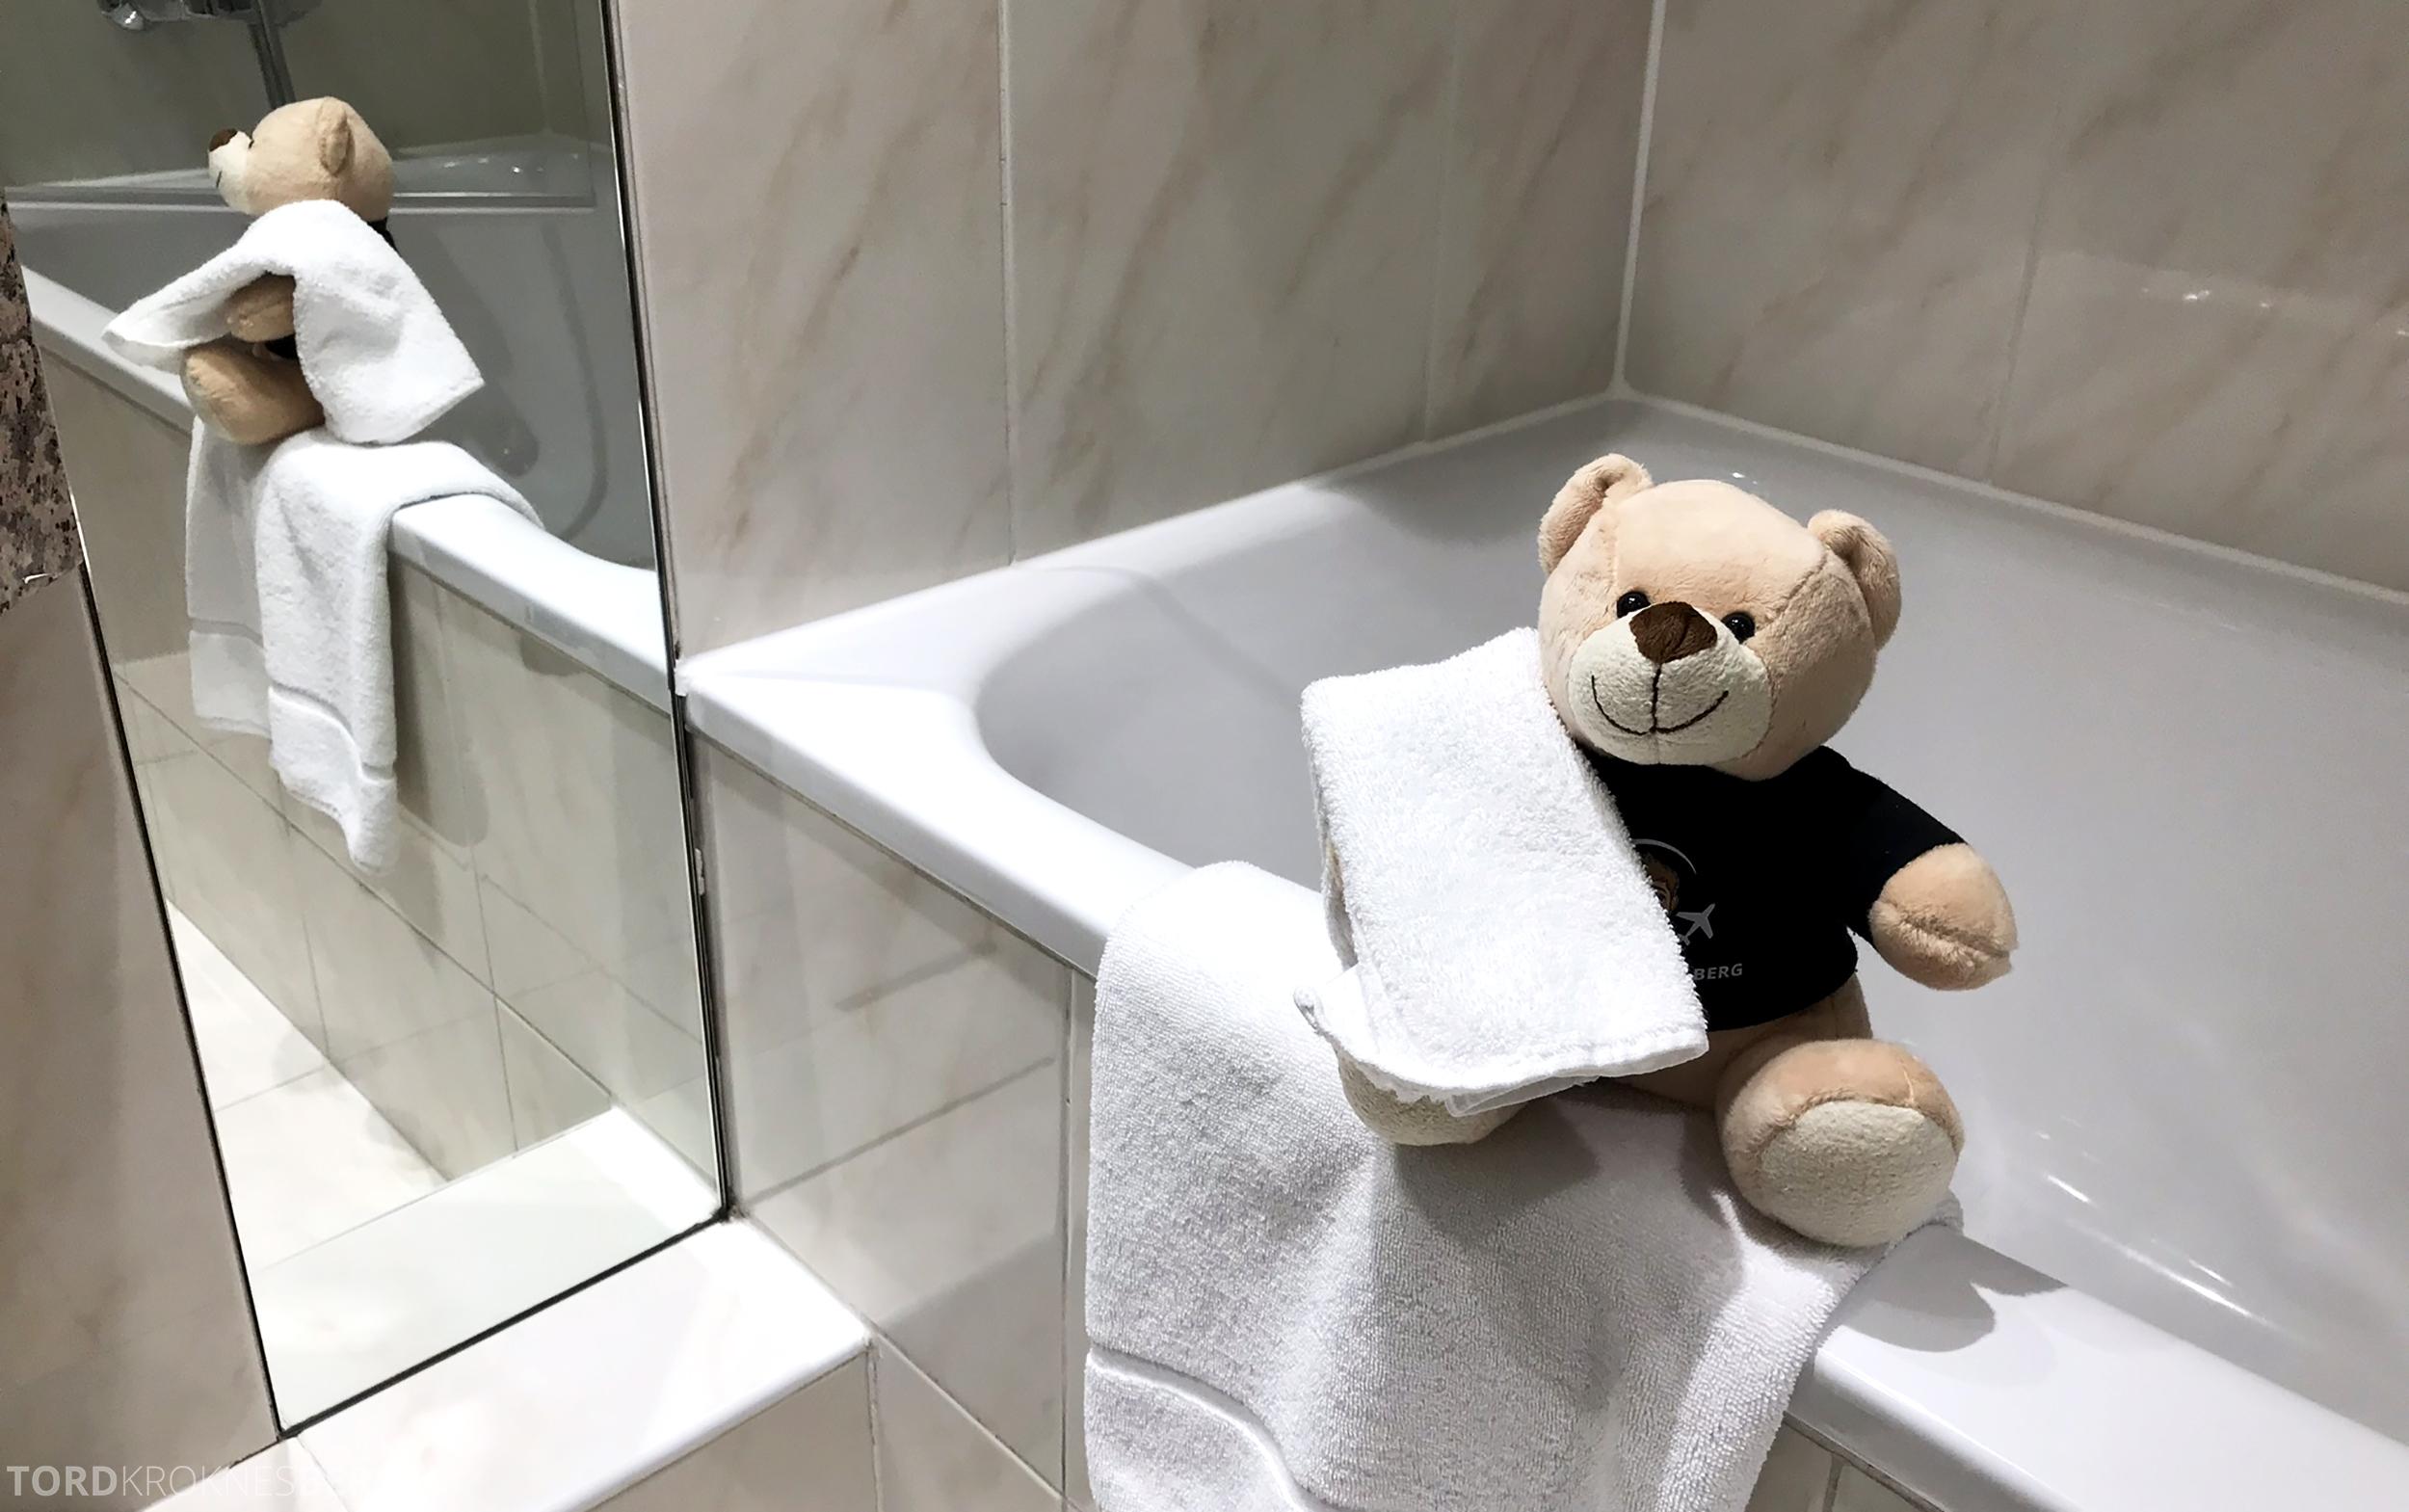 Marriott Paris Rive Gauche reisefølget bad